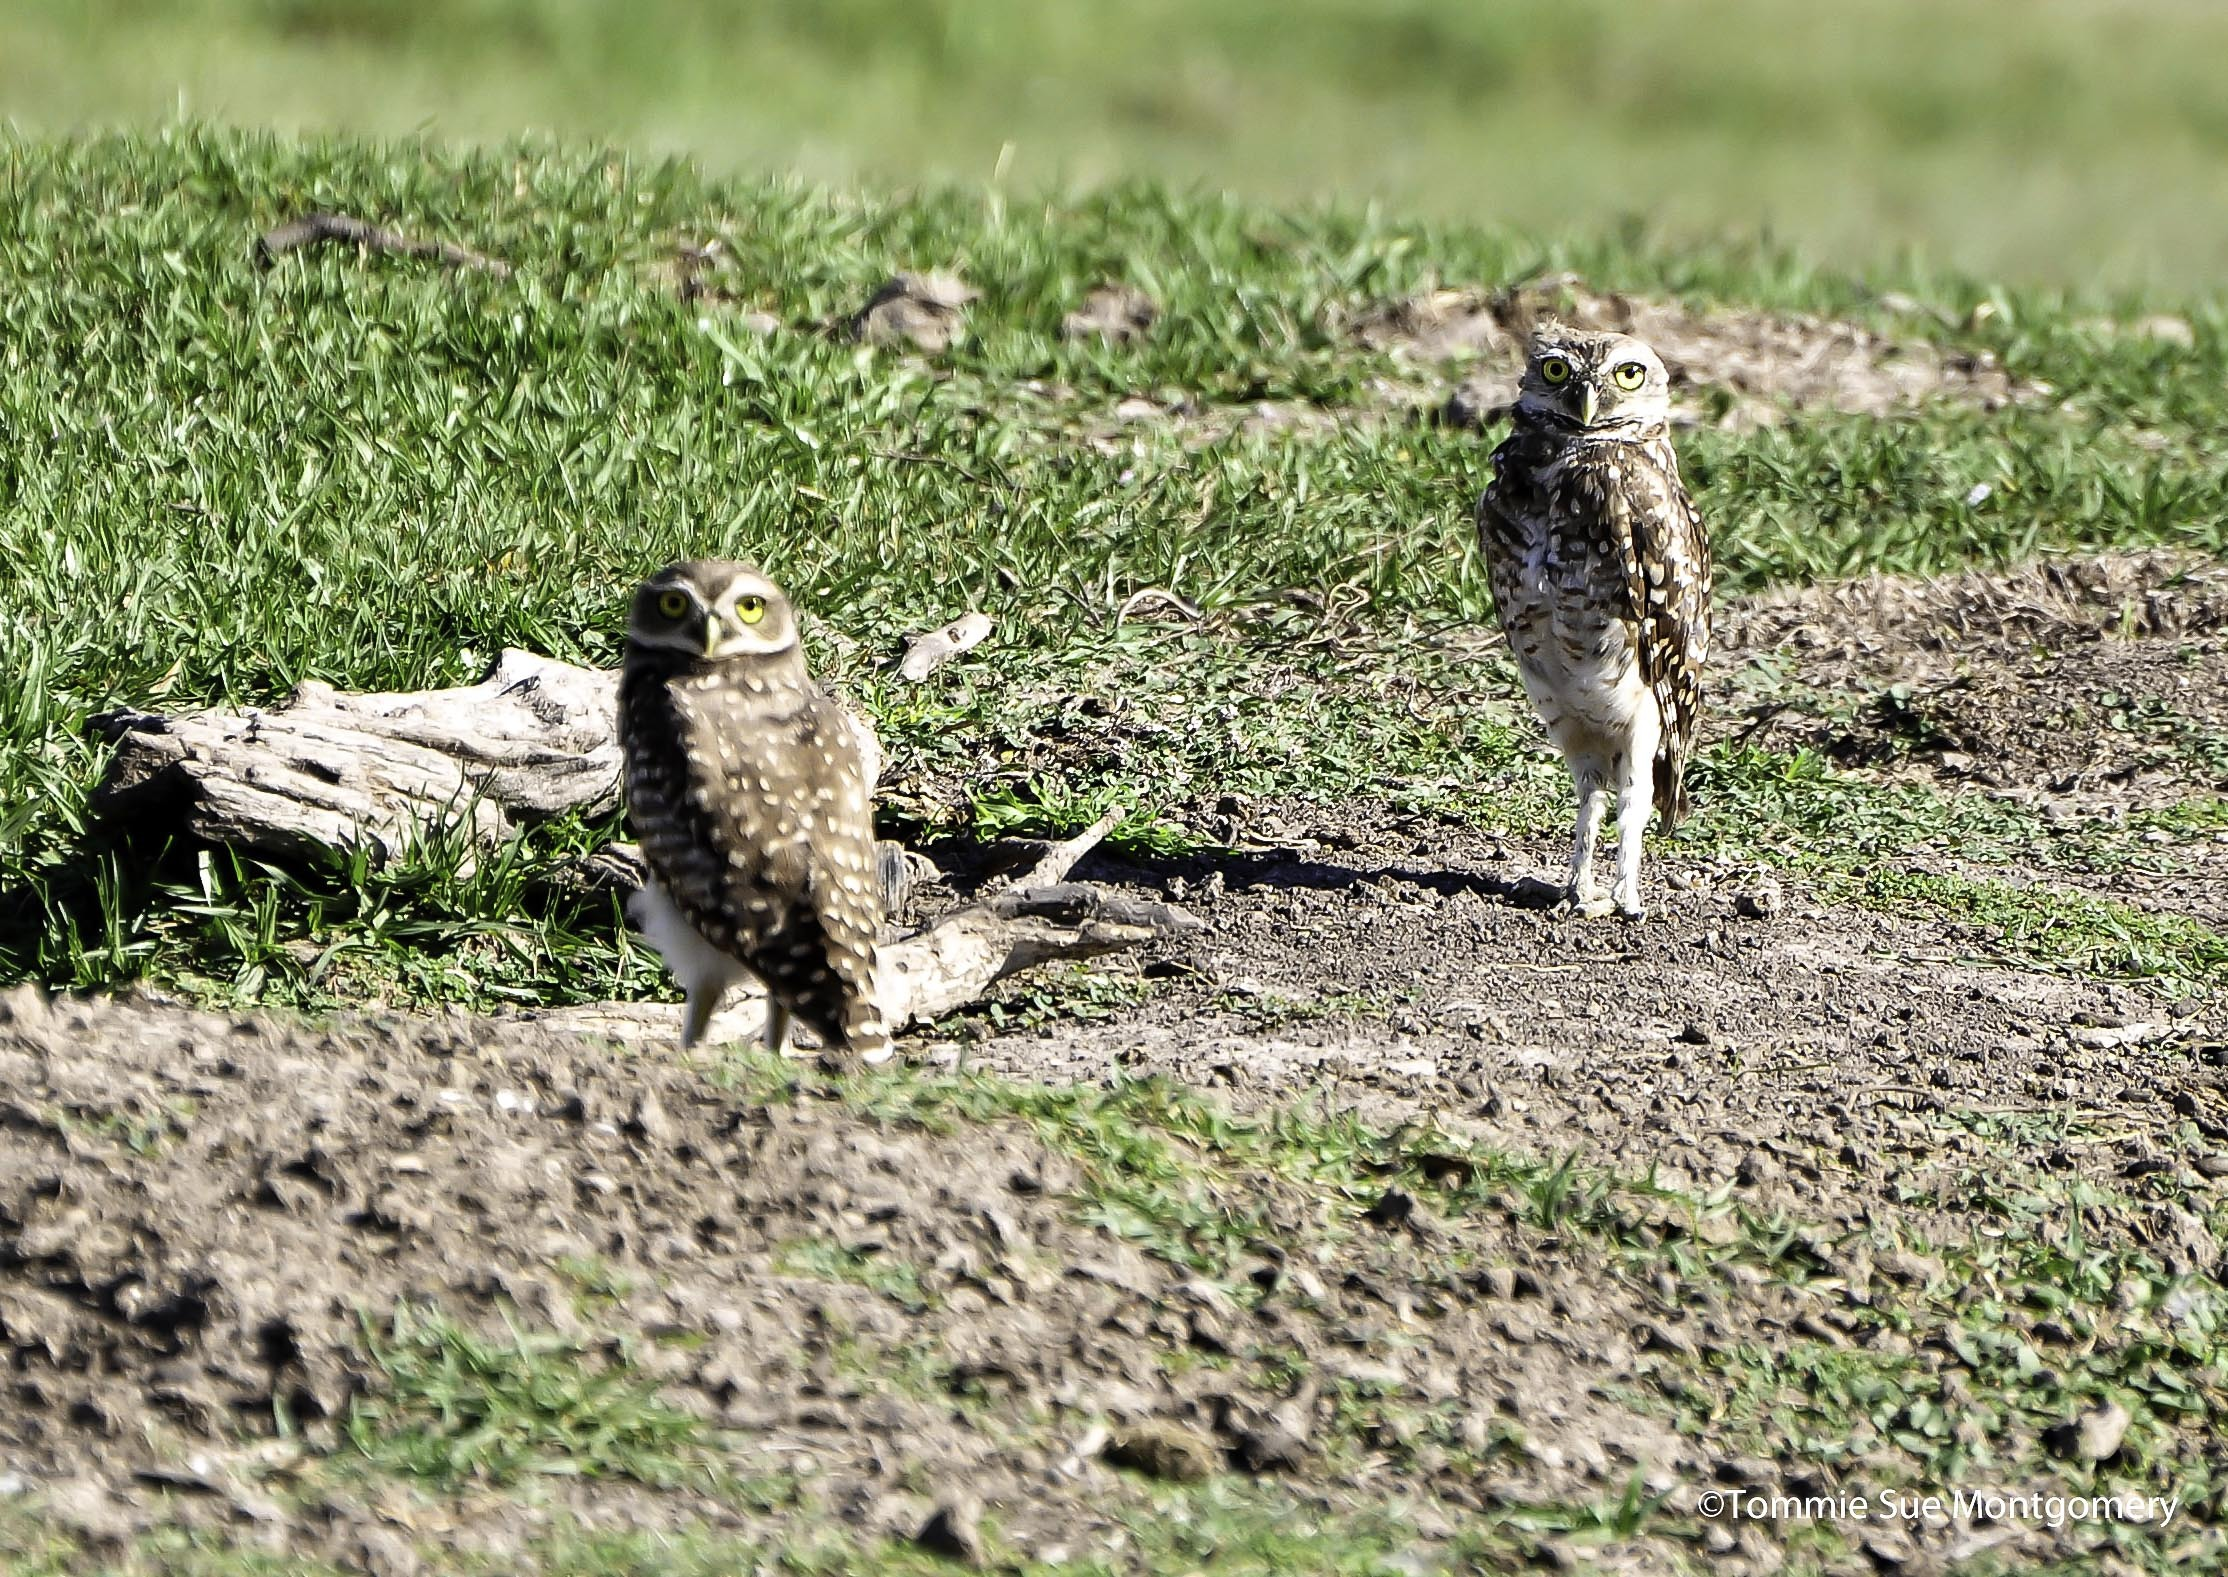 owls next to their burrows